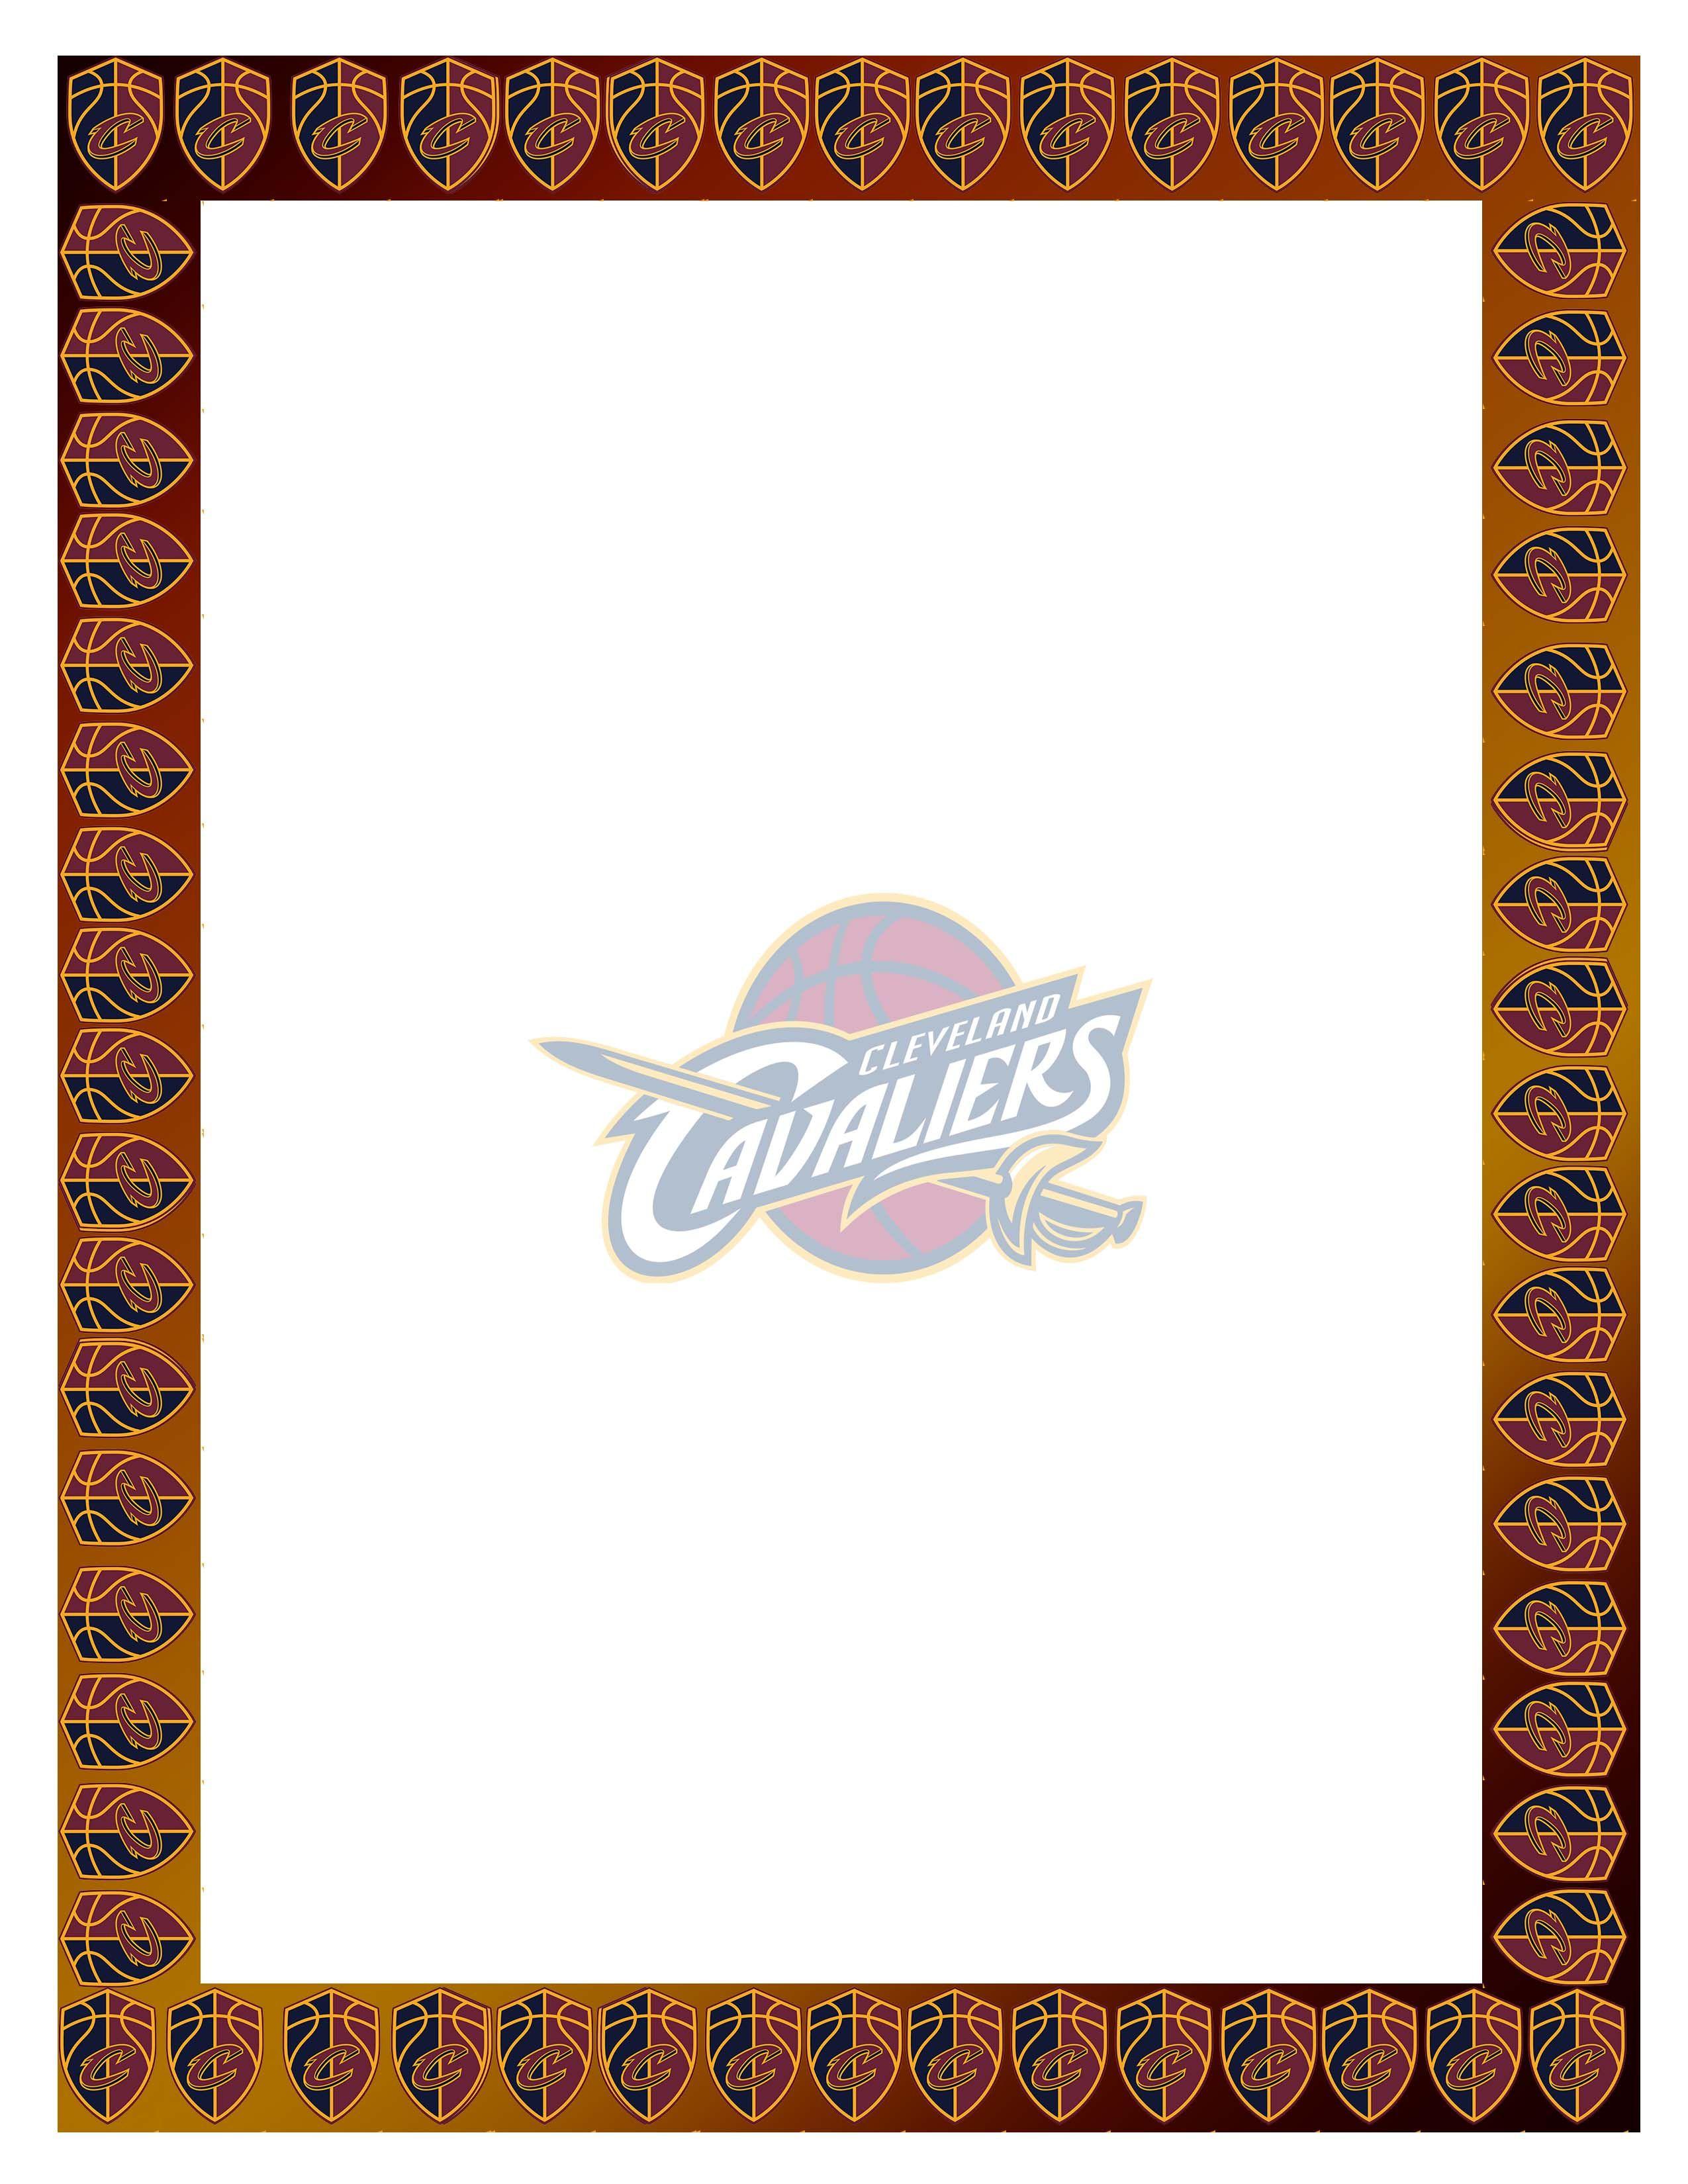 Basketball Cavaliers Border Design#011.